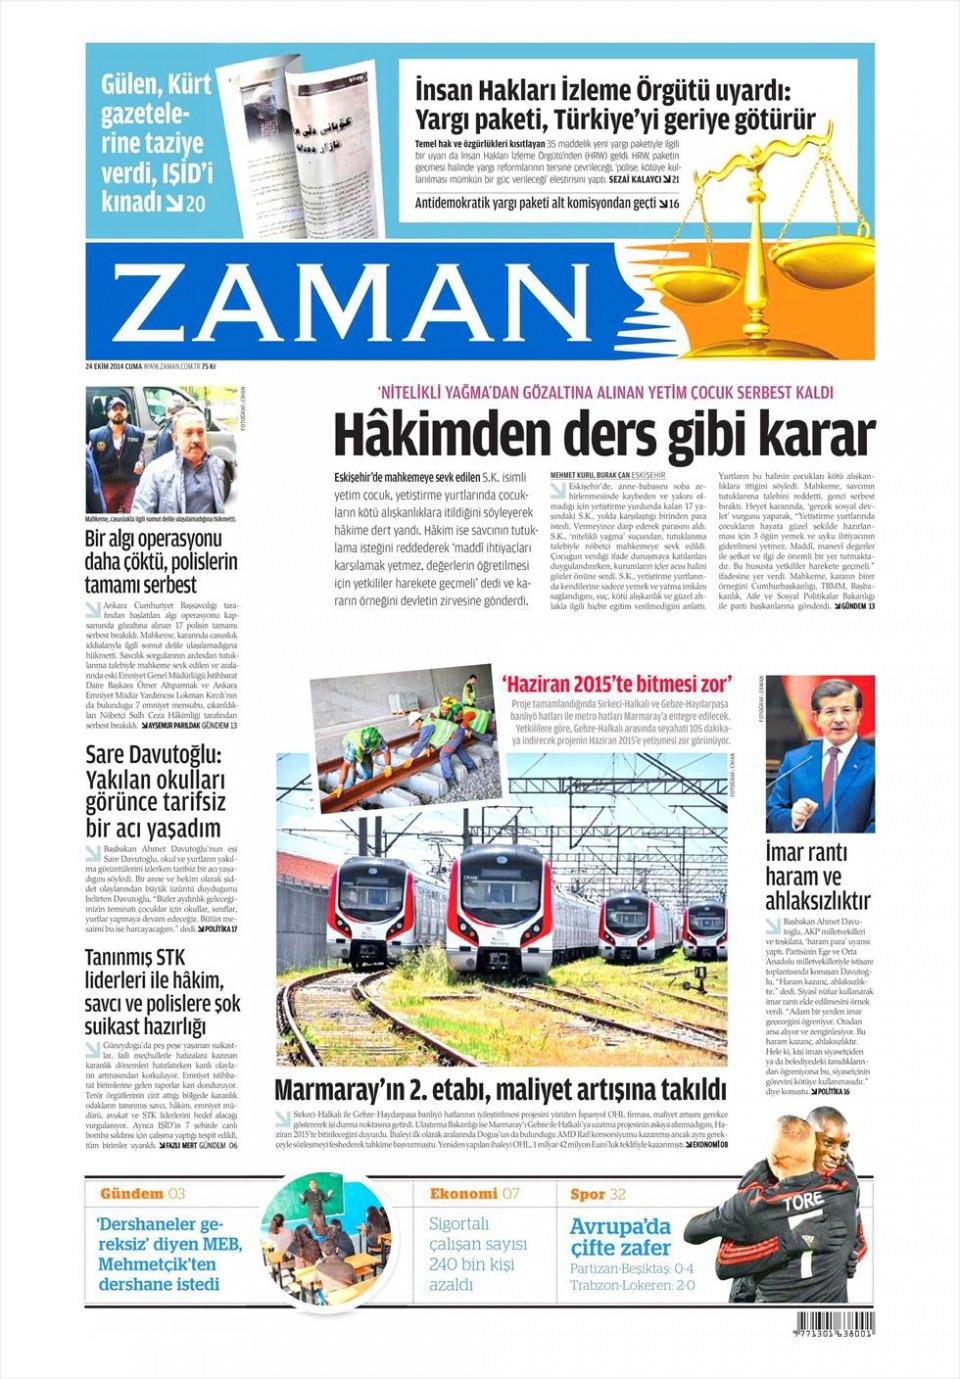 24 Ekim 2014 gazete manşetleri 25